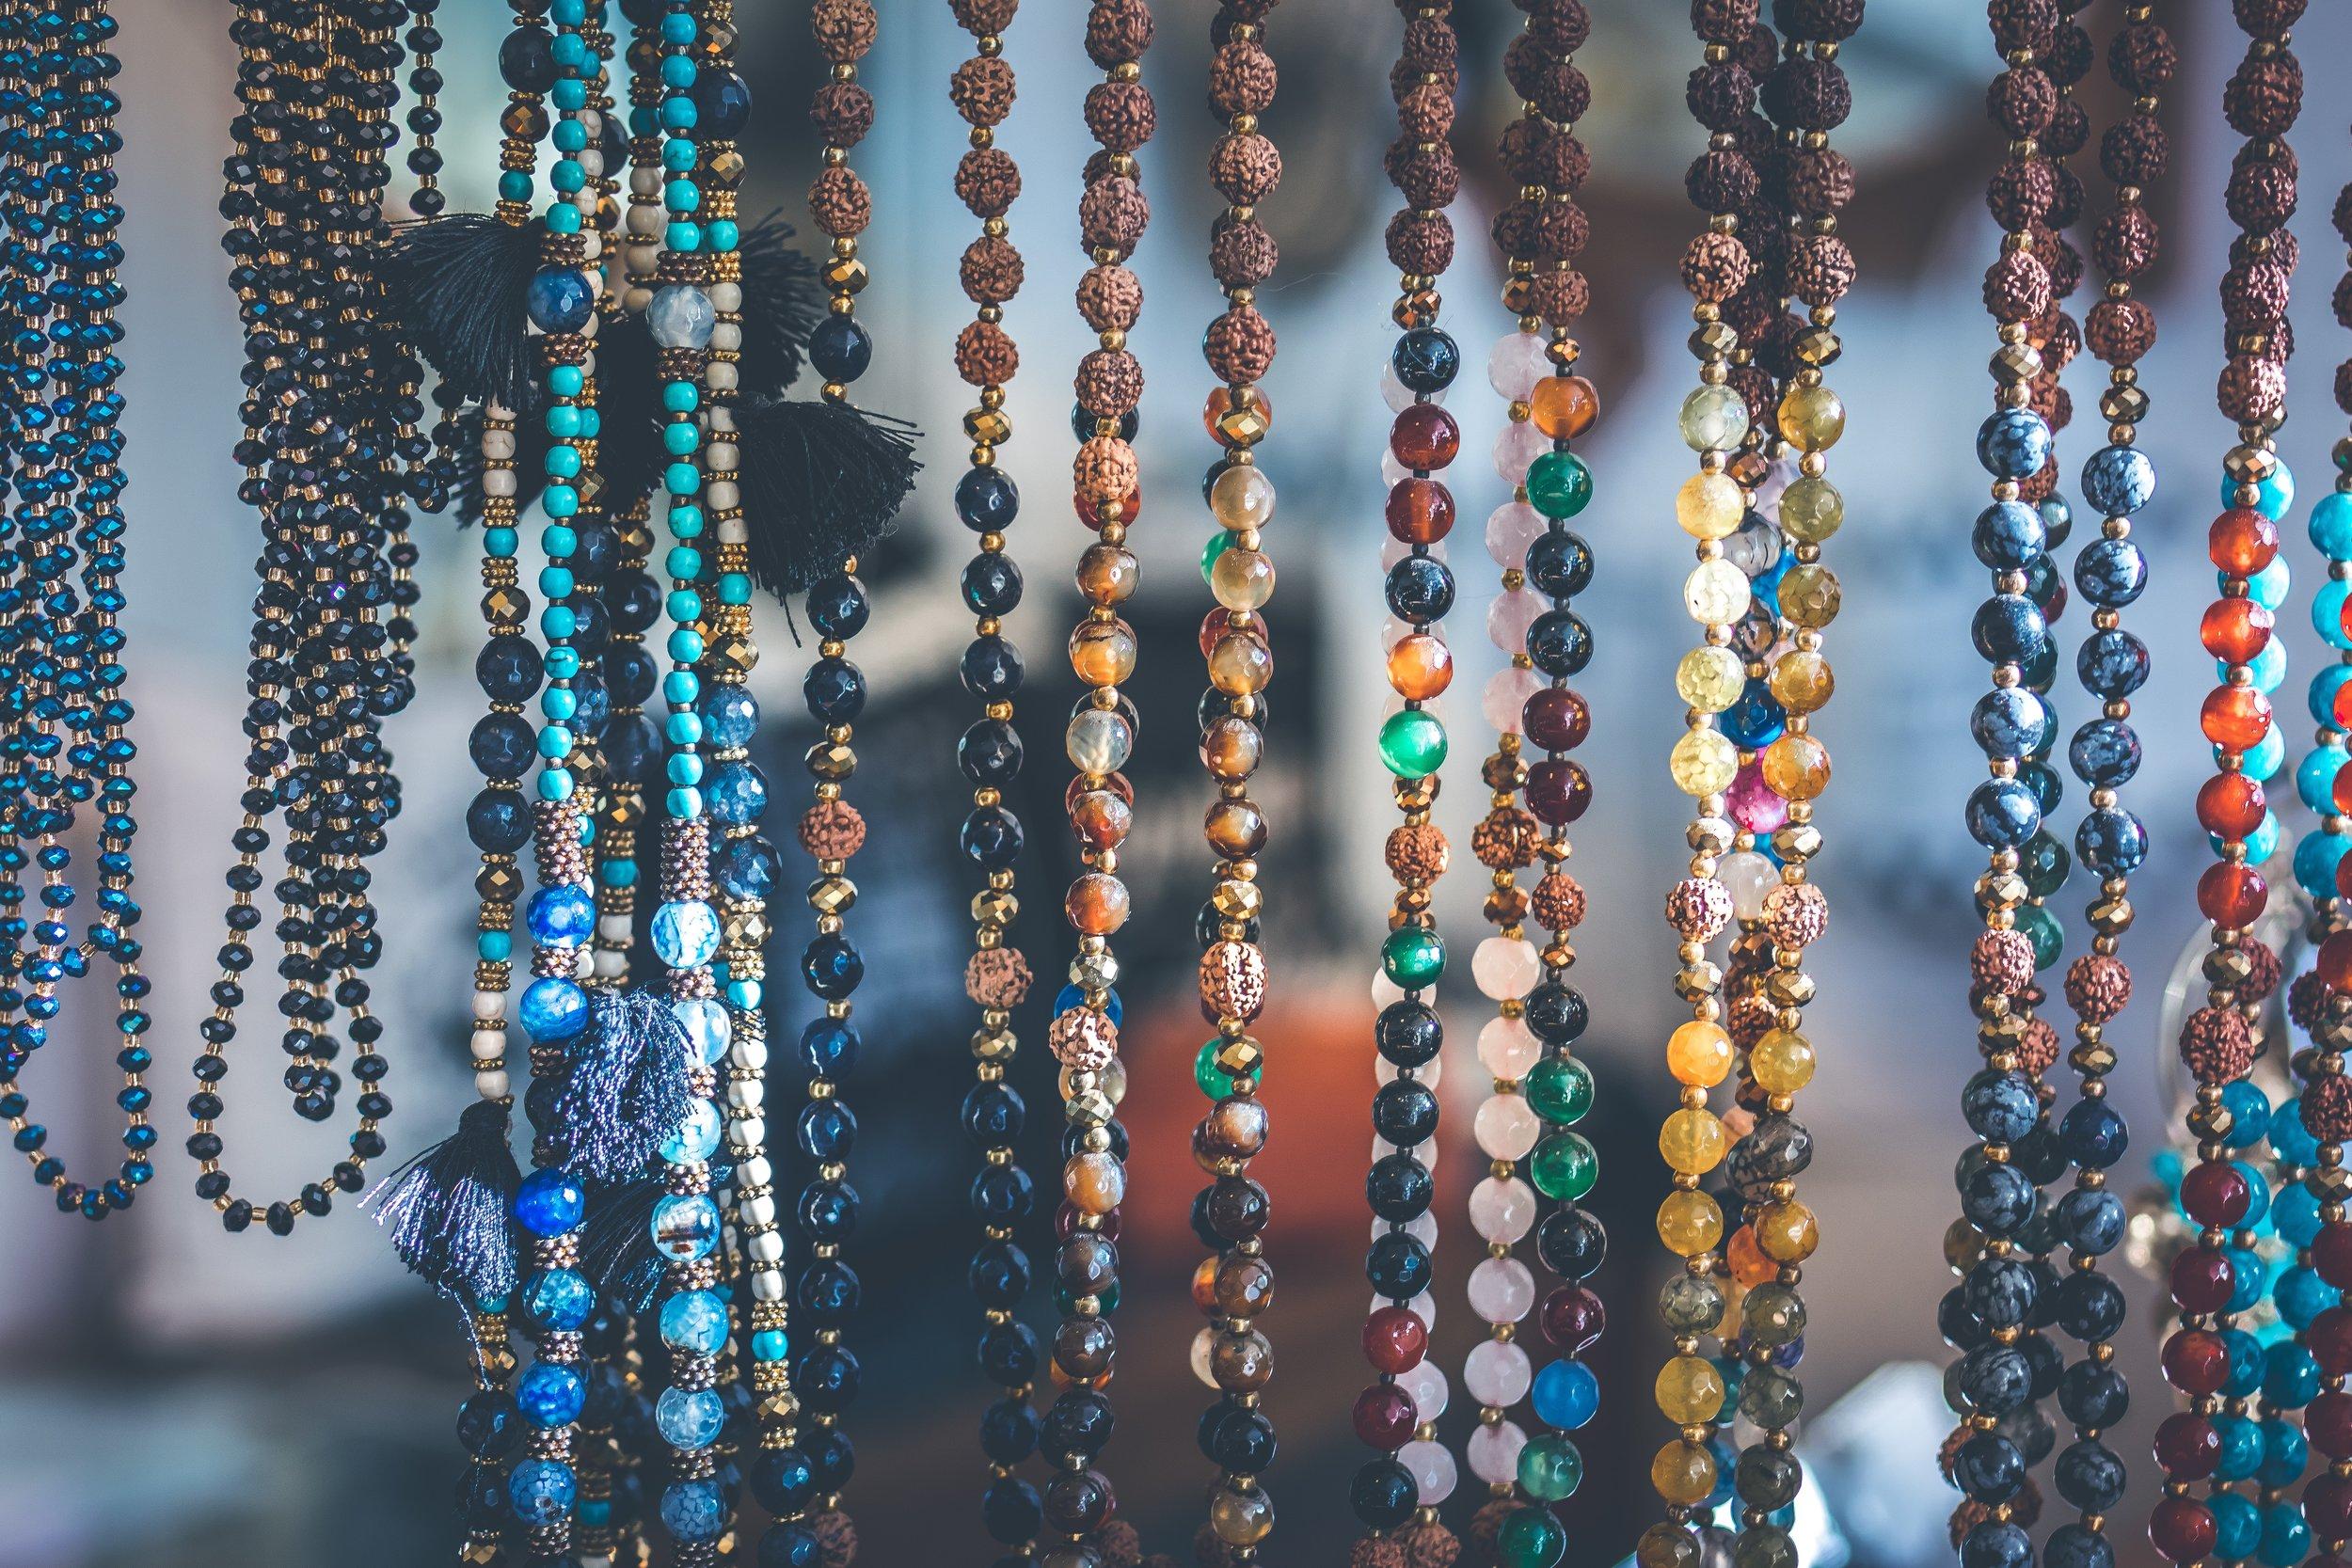 accessory-art-beads-994515.jpg